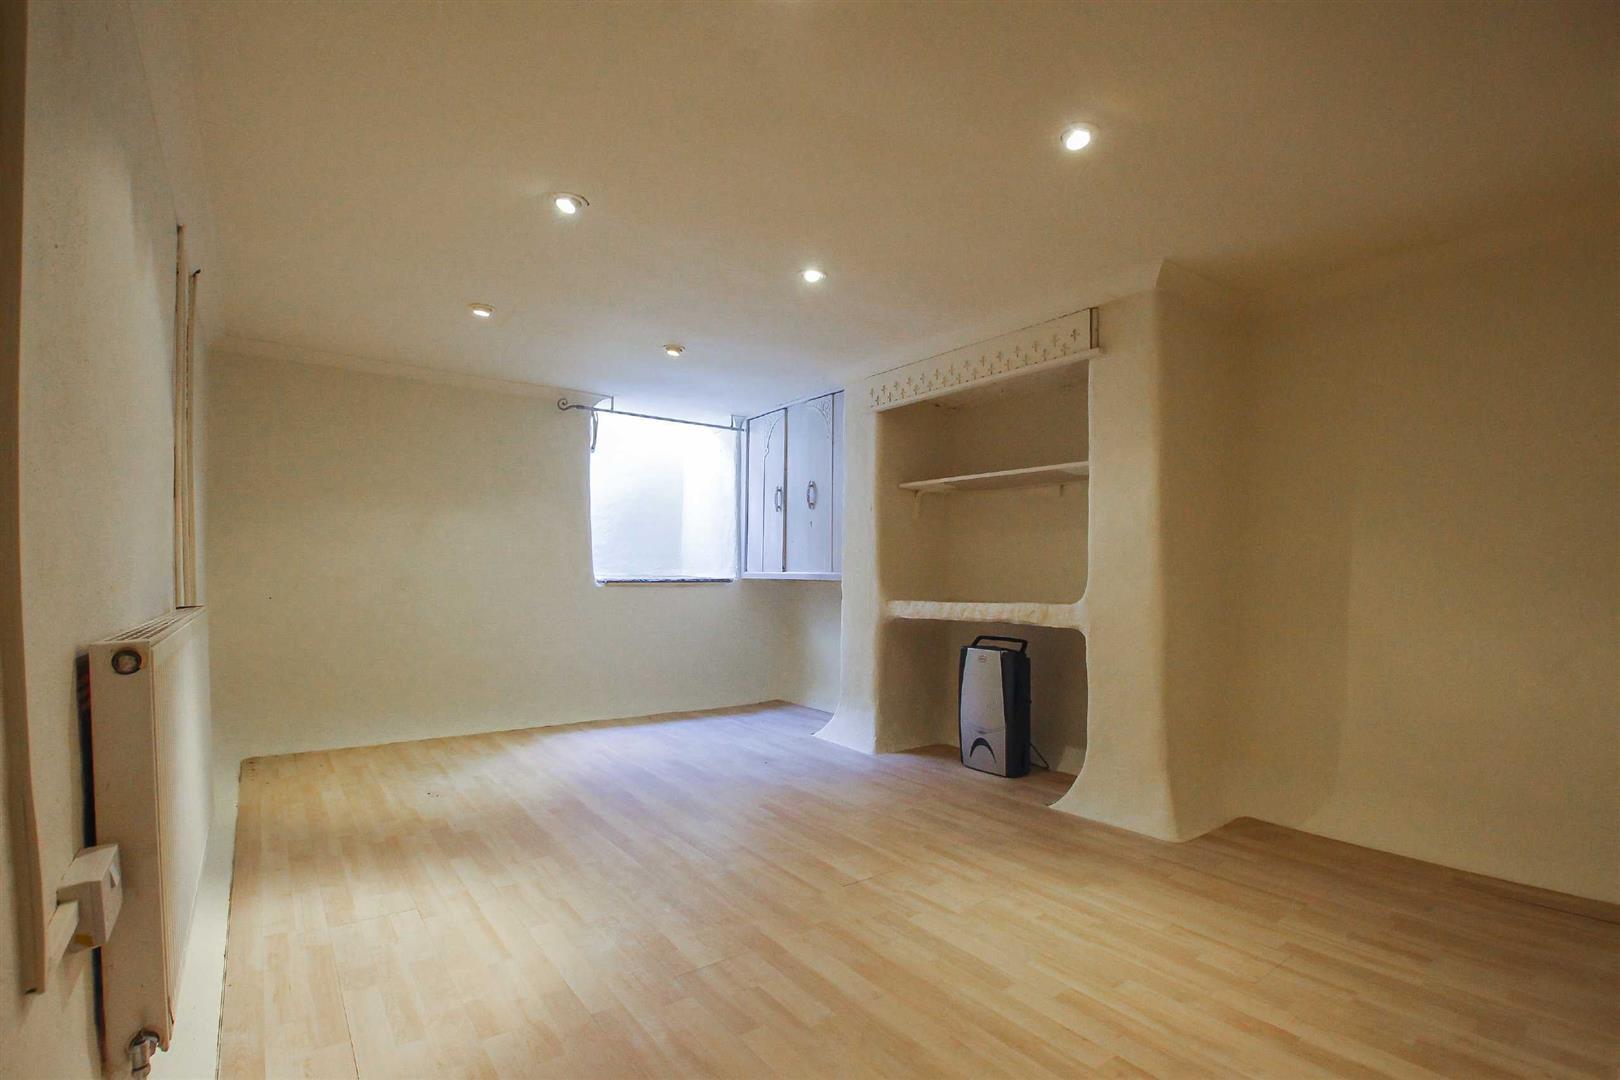 2 Bedroom Detached House For Sale - Image 10